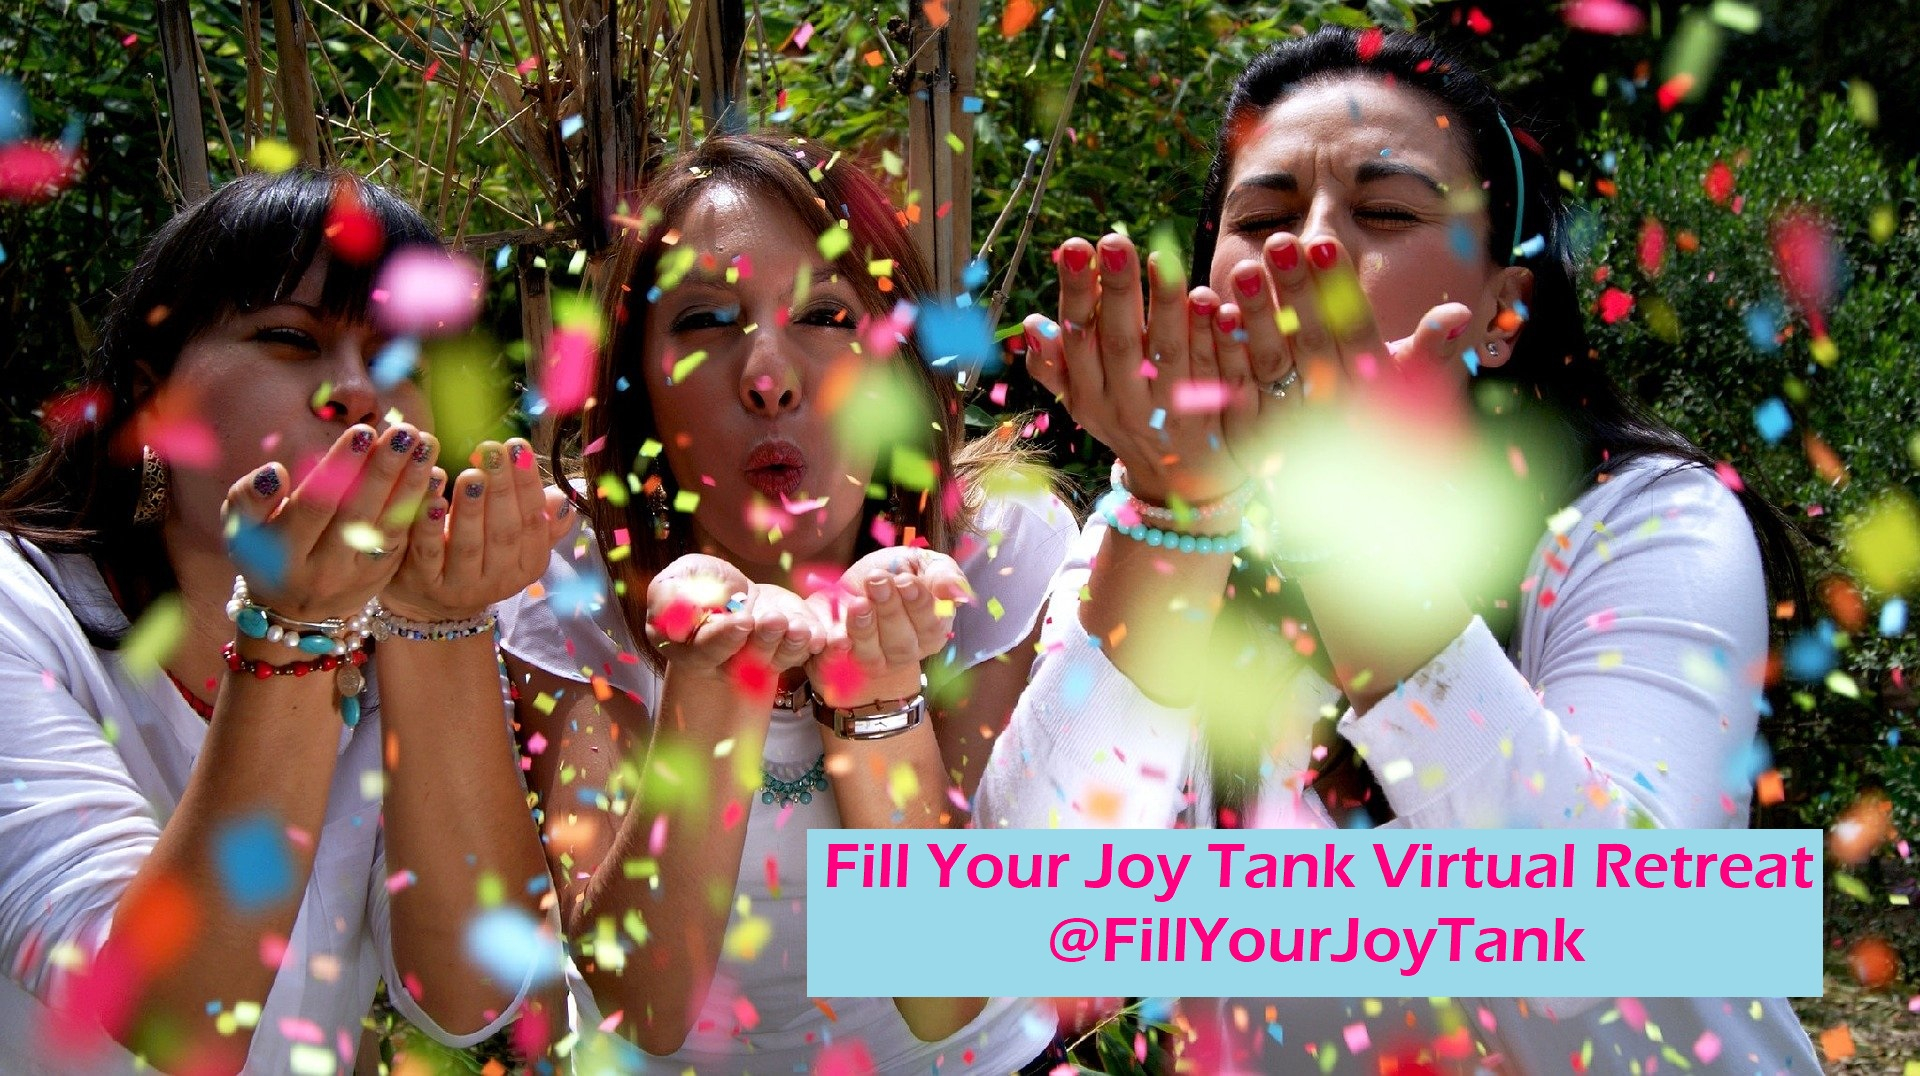 Fill Your Joy Tank retreat